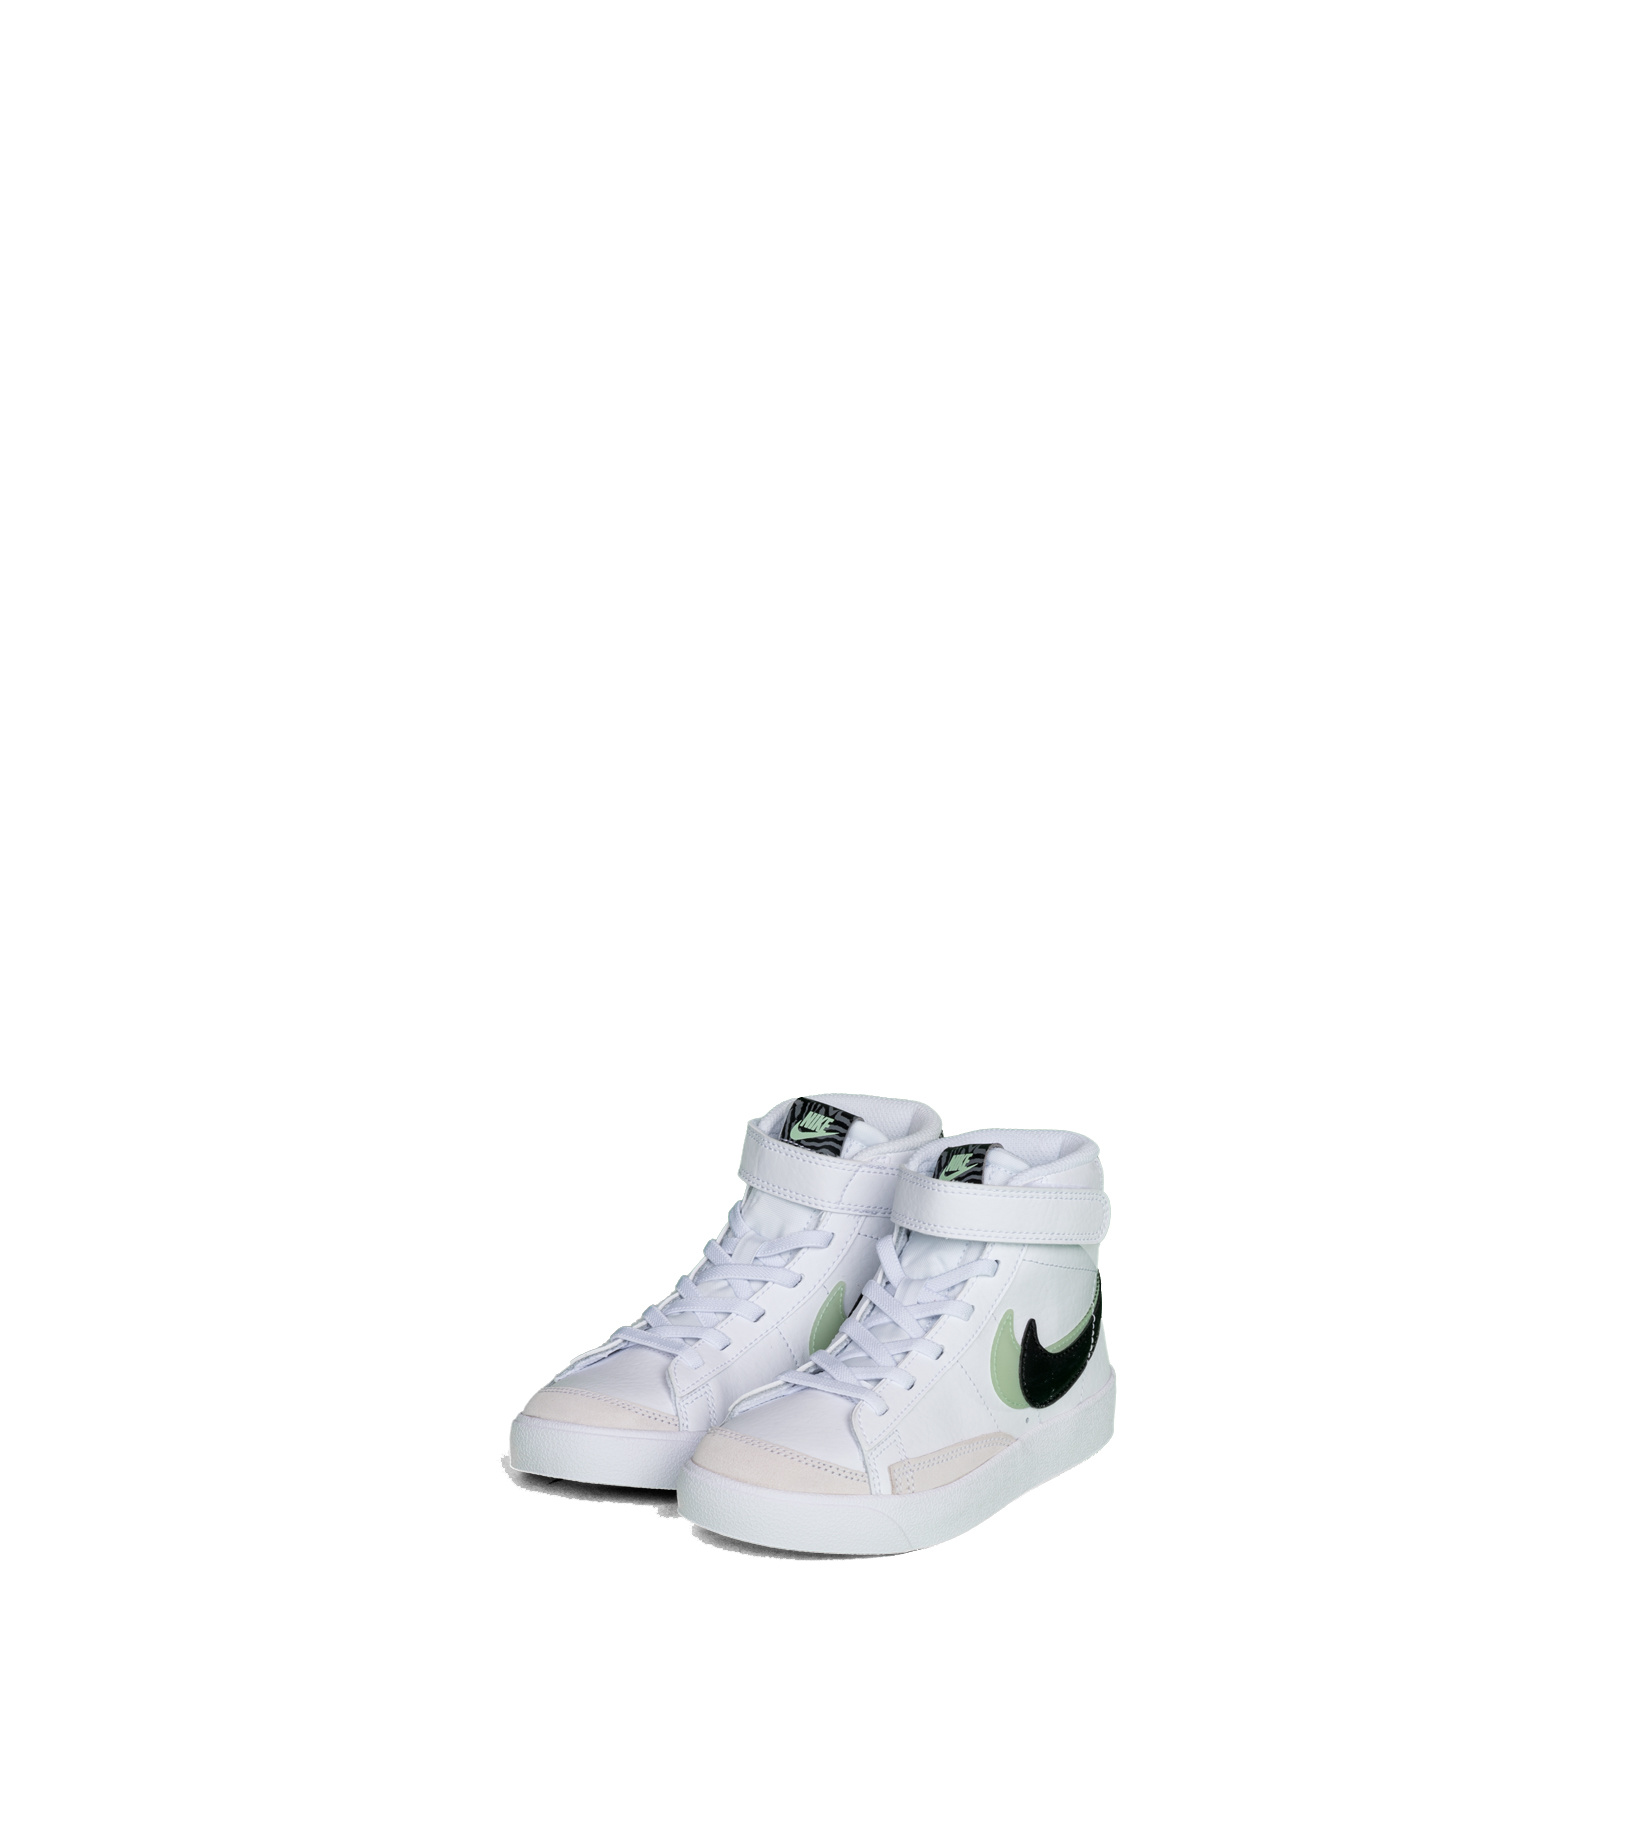 "Blazer Mid '77 SE (PS)  ""White/Vapor Green""-1"